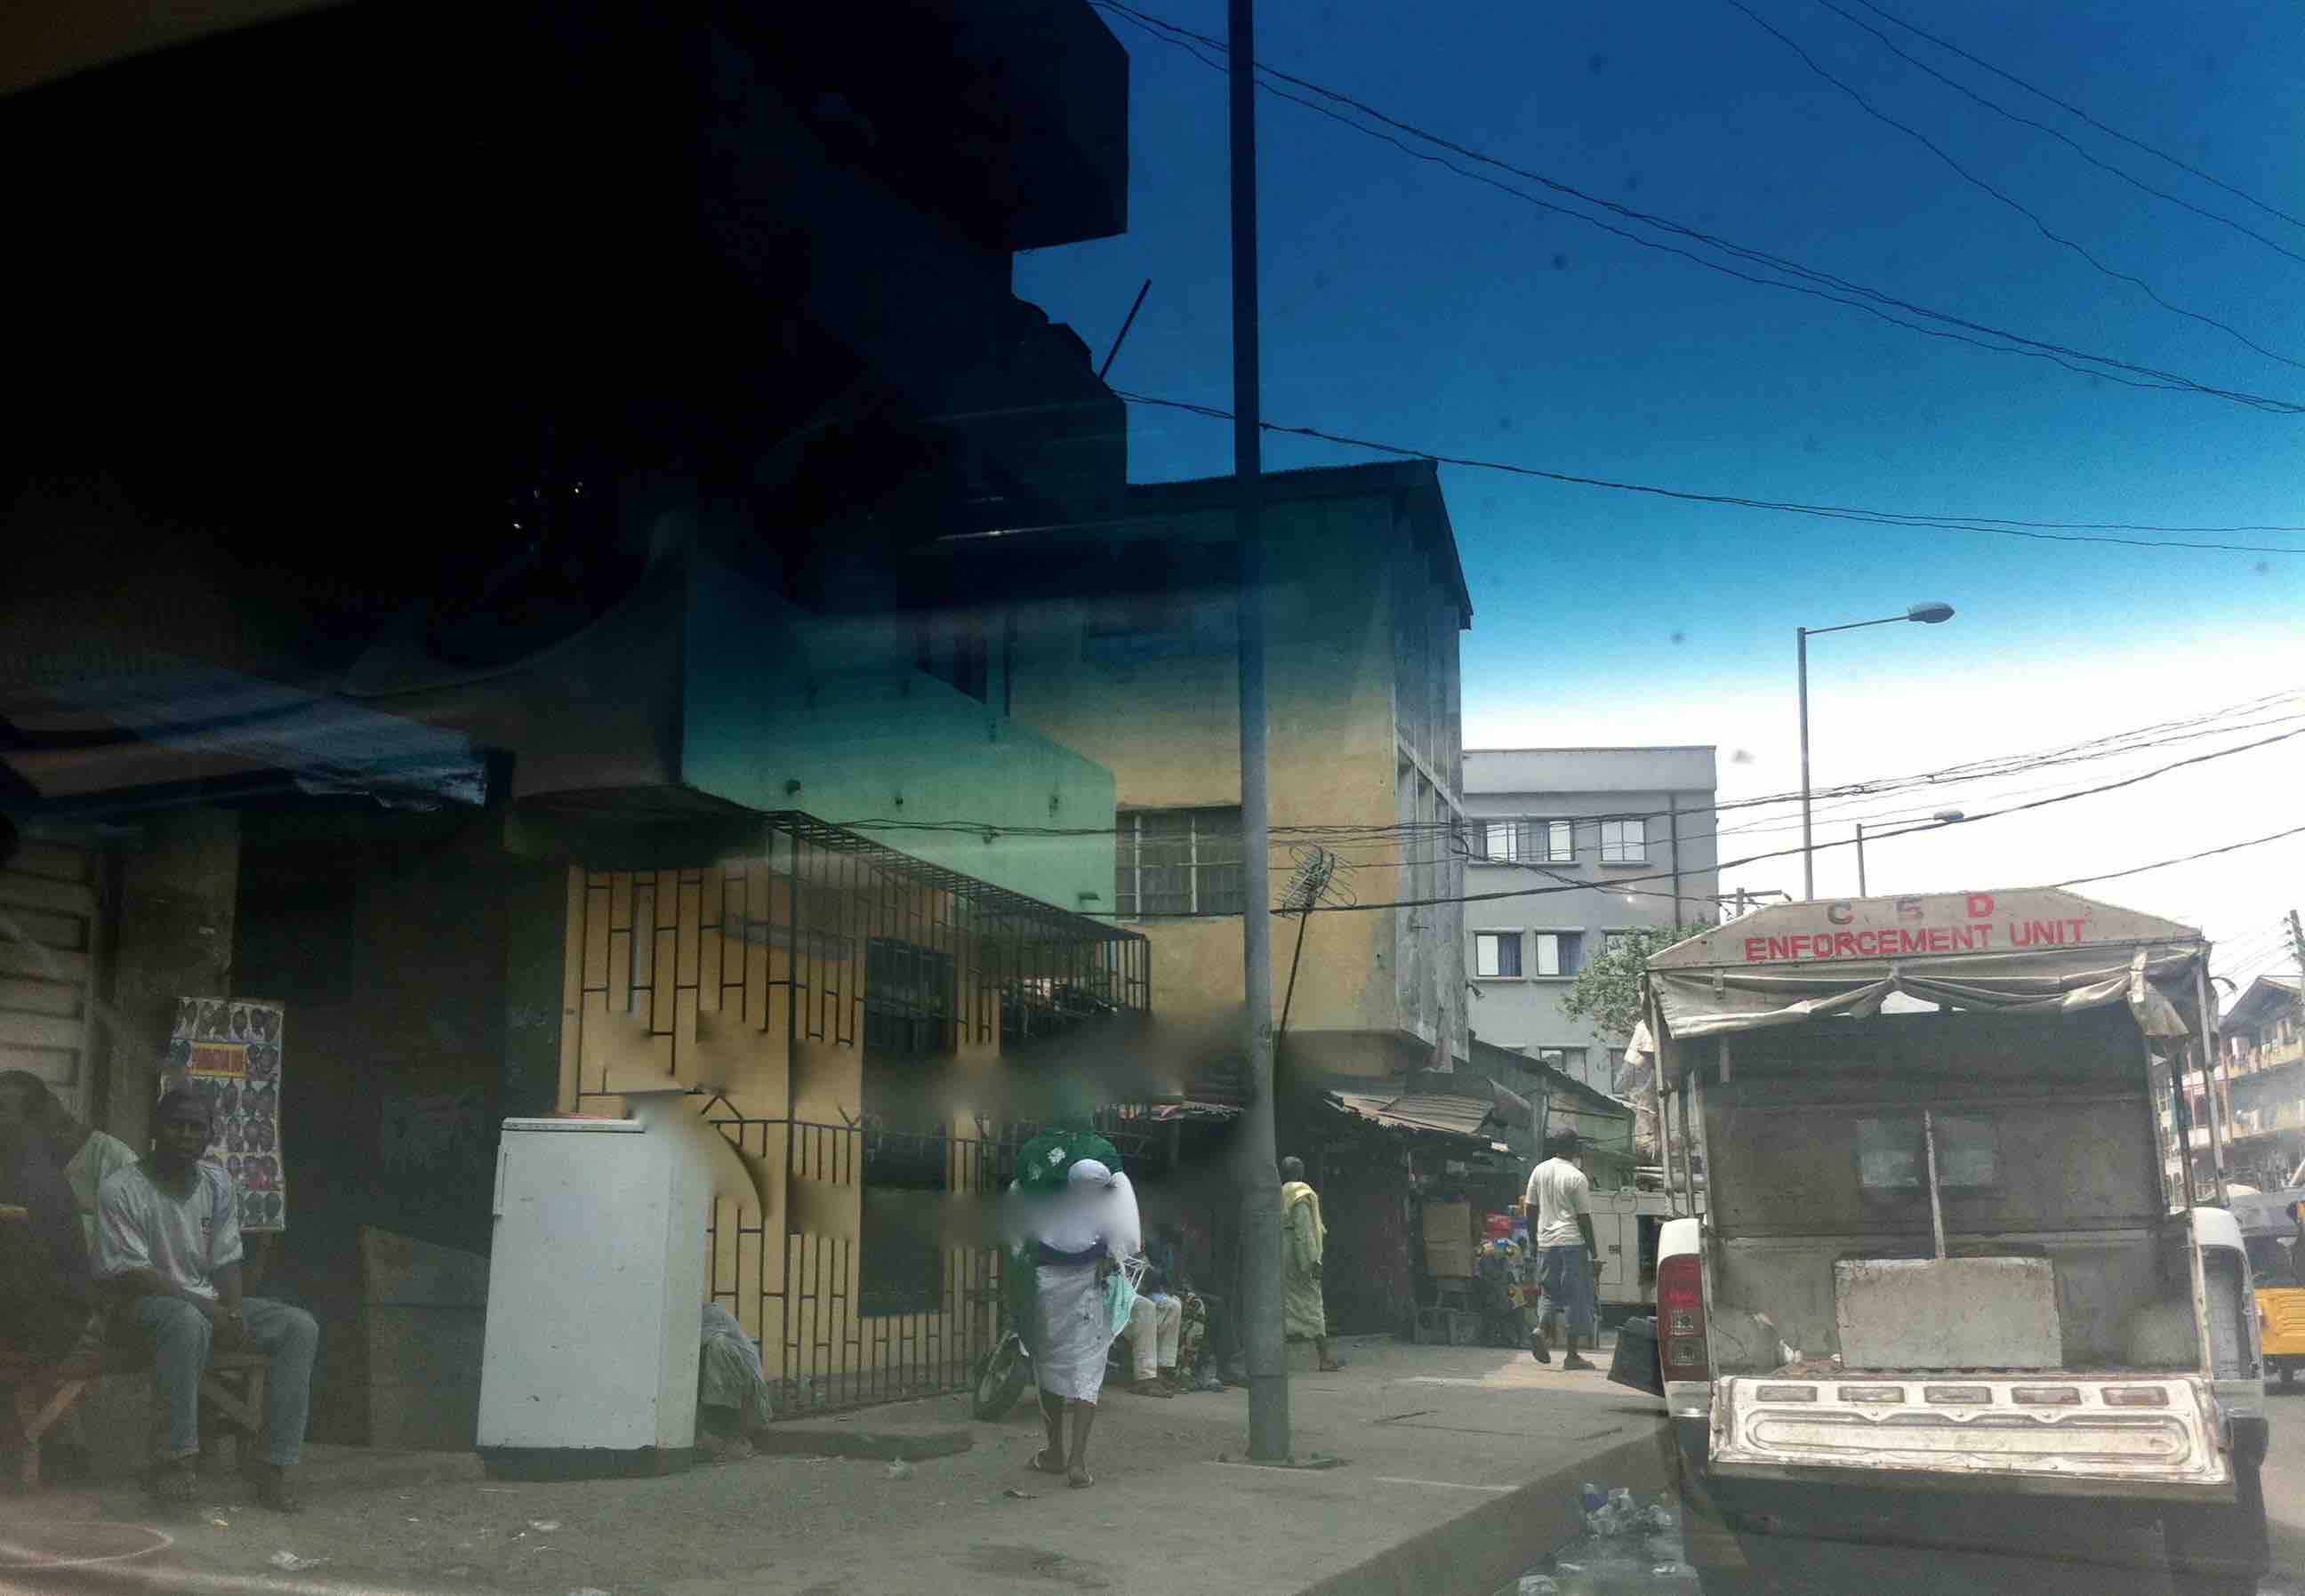 Bamgbose Street, Lagos Island, Nigeria. #JujuFilms